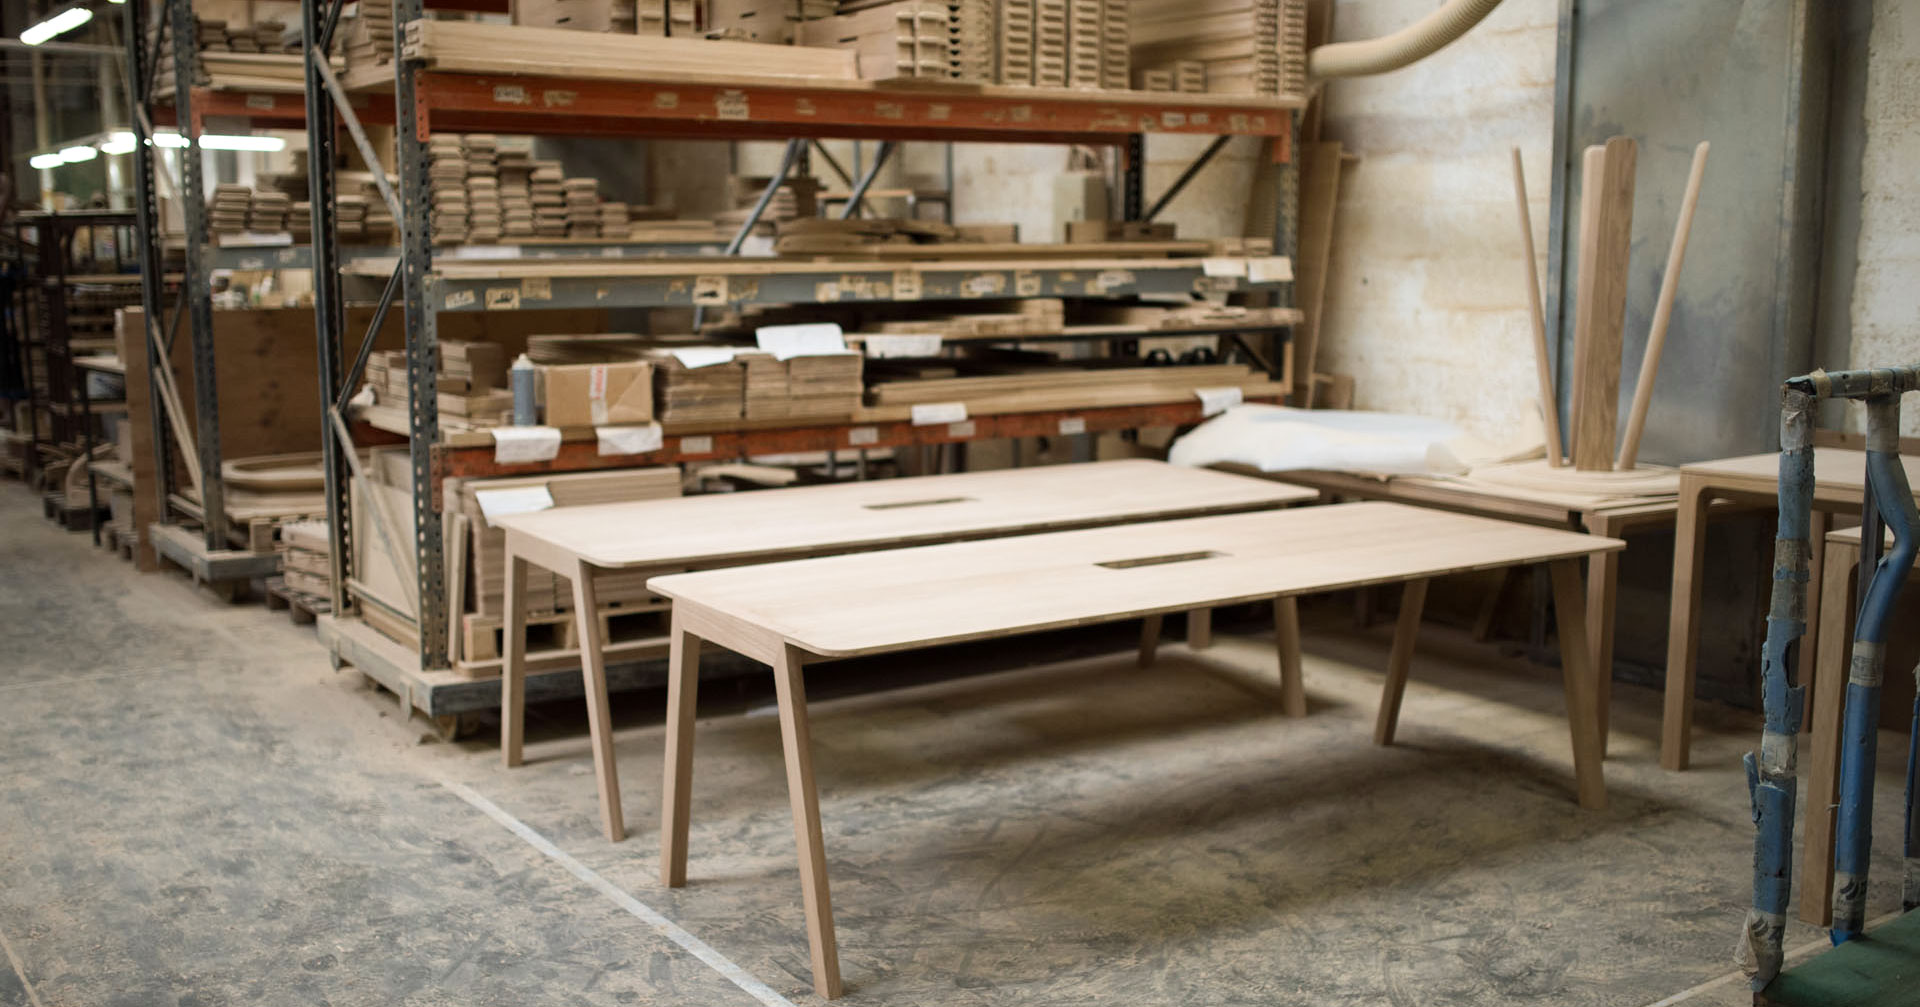 Bespoke Furniture Workshop